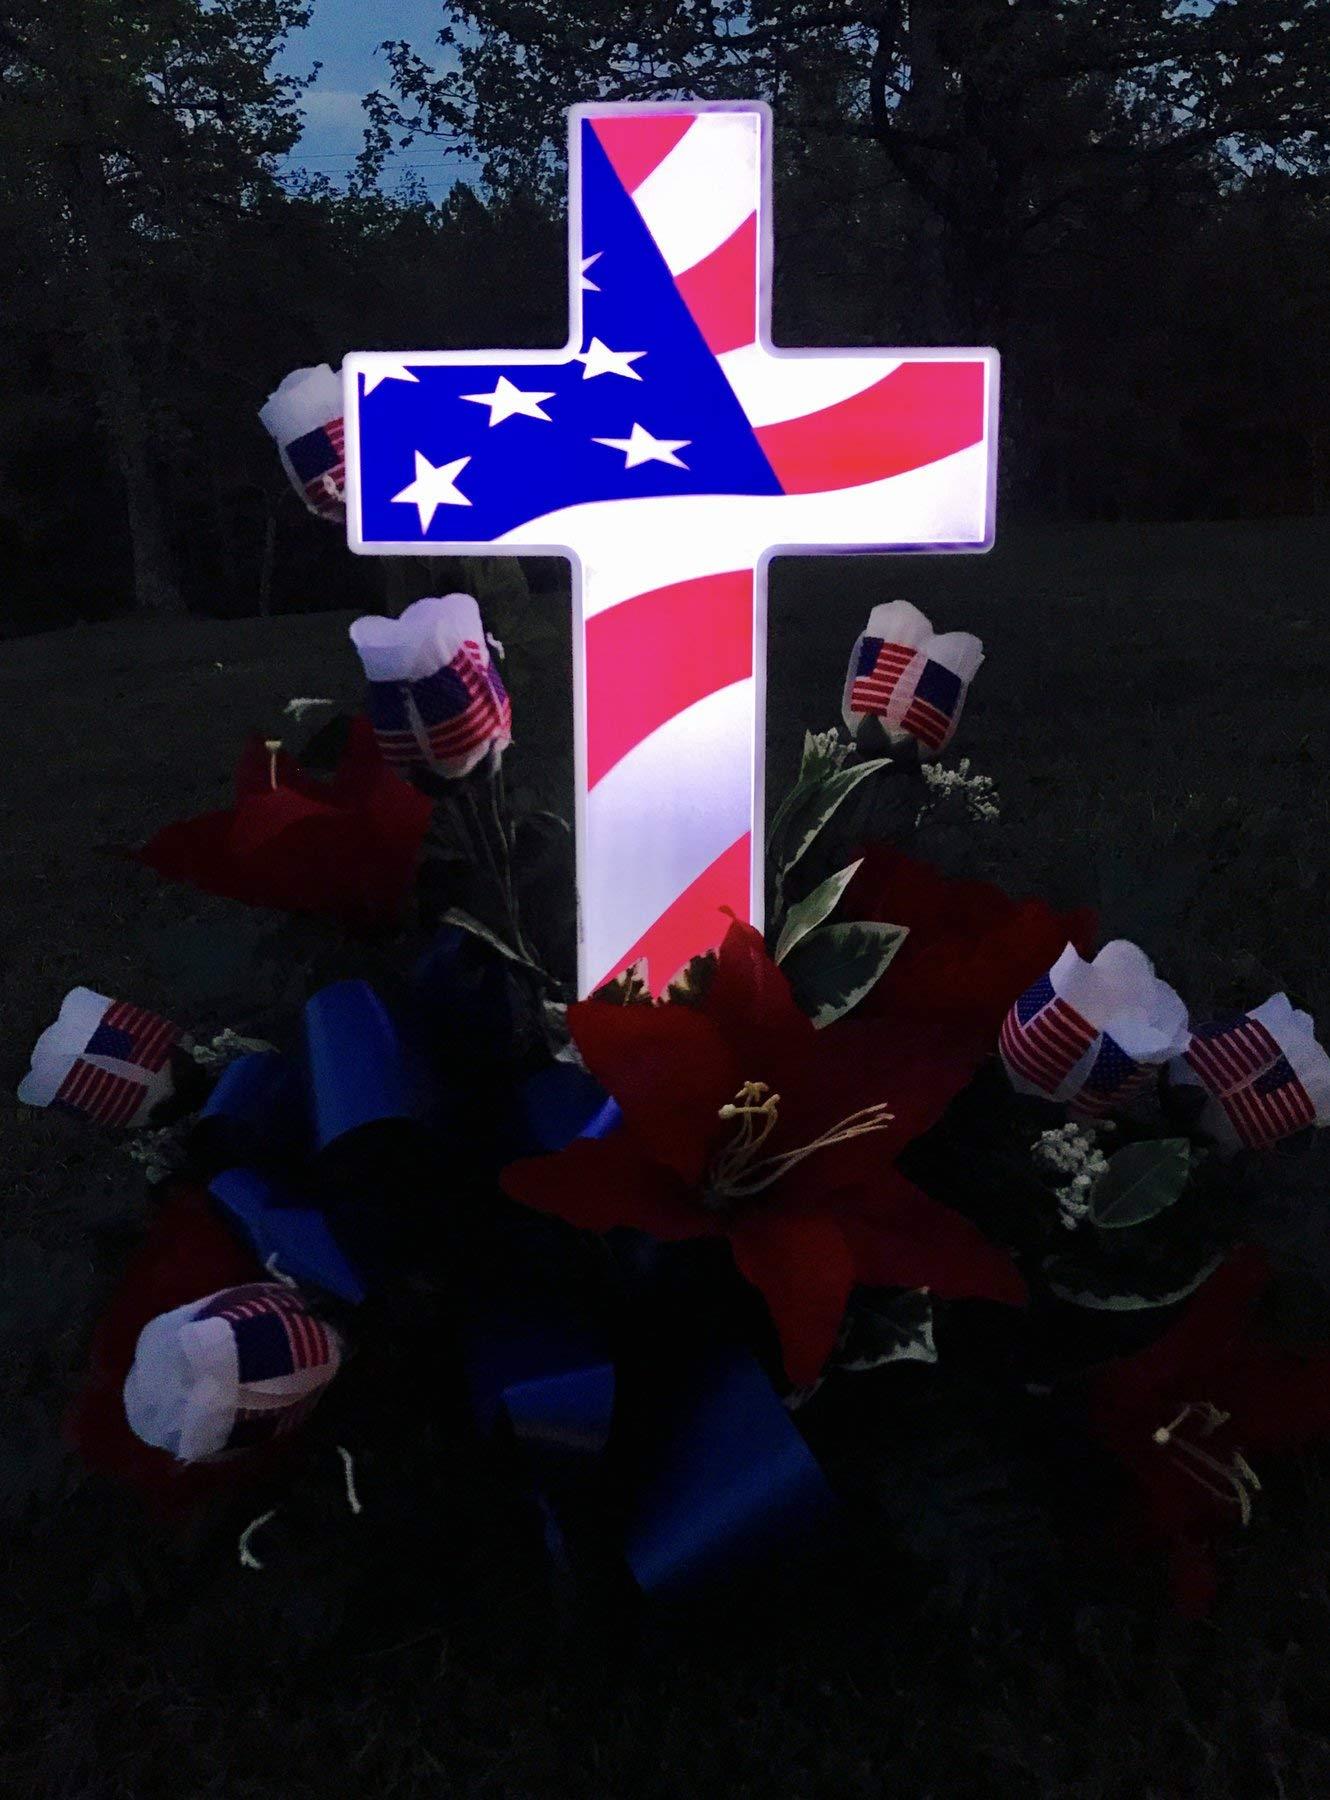 Solar-Lighted-American-Flag-Cross-by-Eternal-Light-Veteran-Cross-Decoration-Heartfelt-Cemetery-Memorial-14-x-10